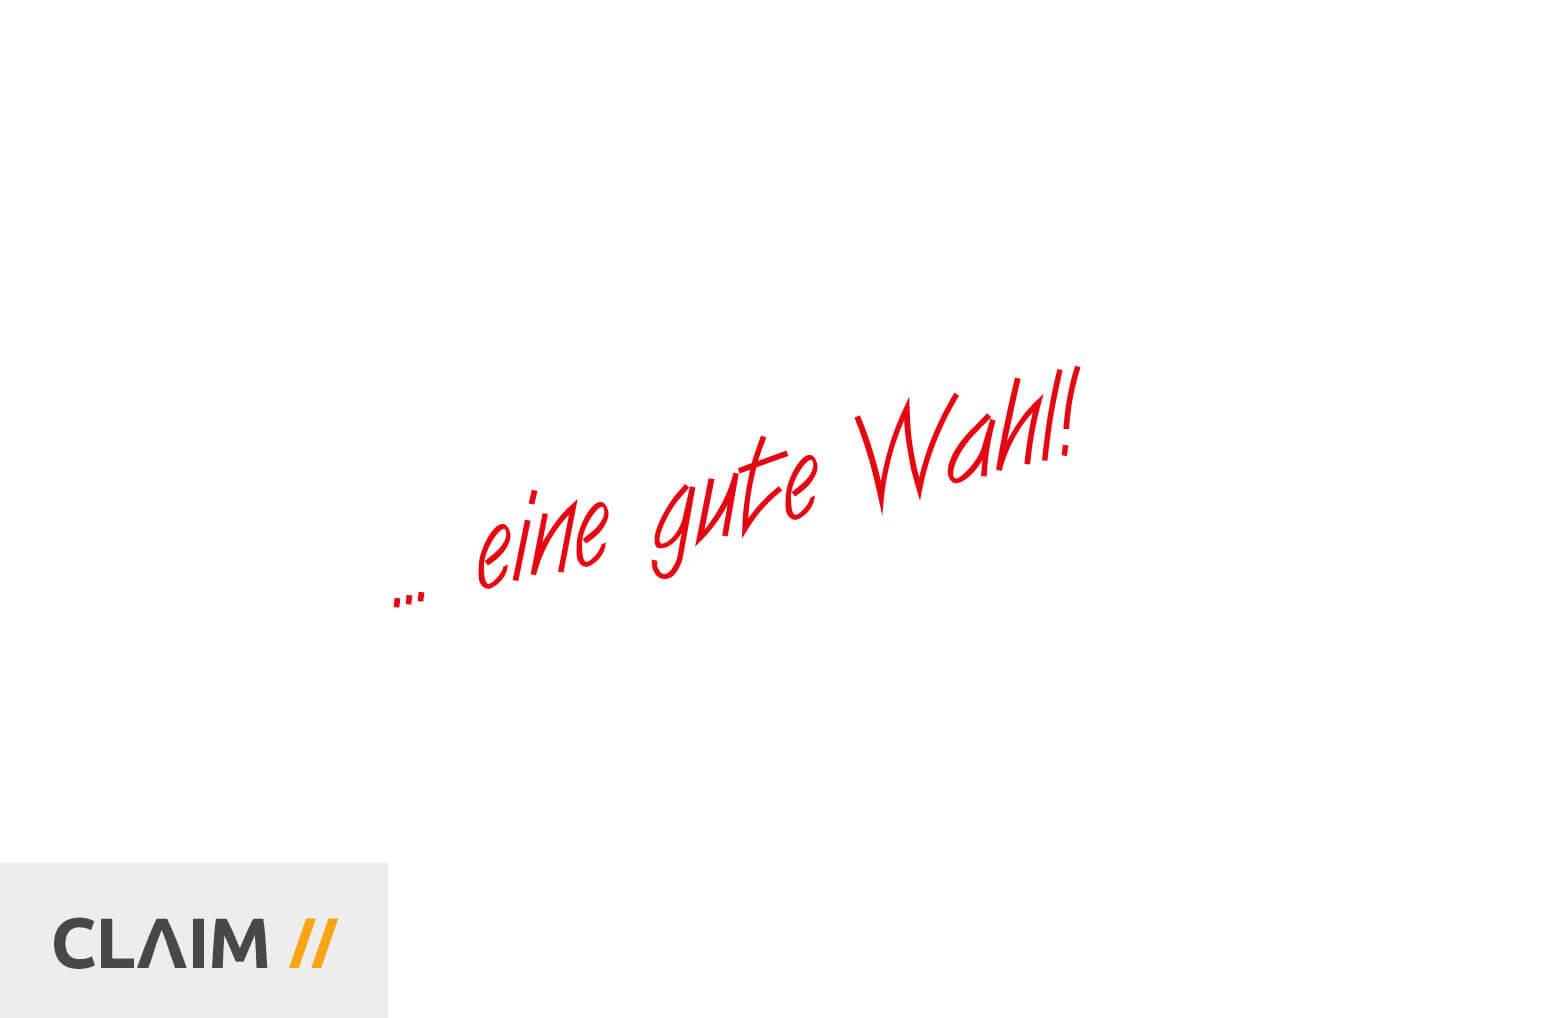 uhl_relaunch_1565x1018_alt_2